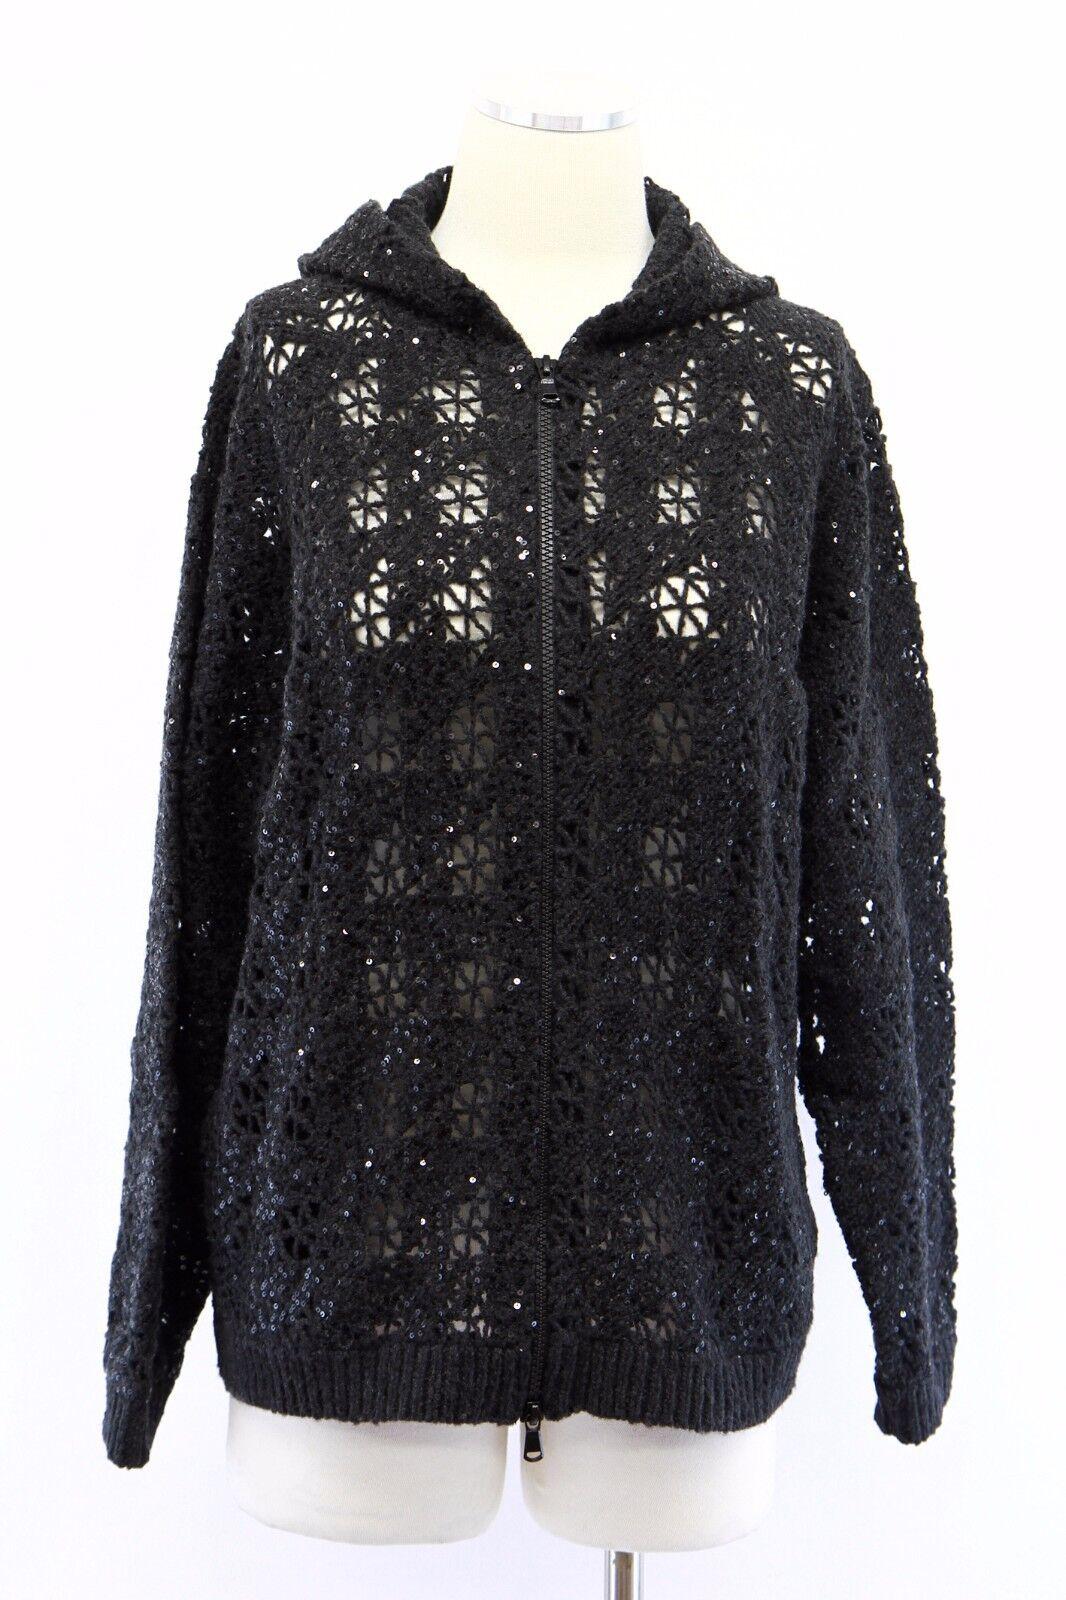 NWT  5445 Brunello Cucinelli Cucinelli Cucinelli Cashmere-Wool Sparkly Sequined Crochet Zip Hoodie M 0dbee4